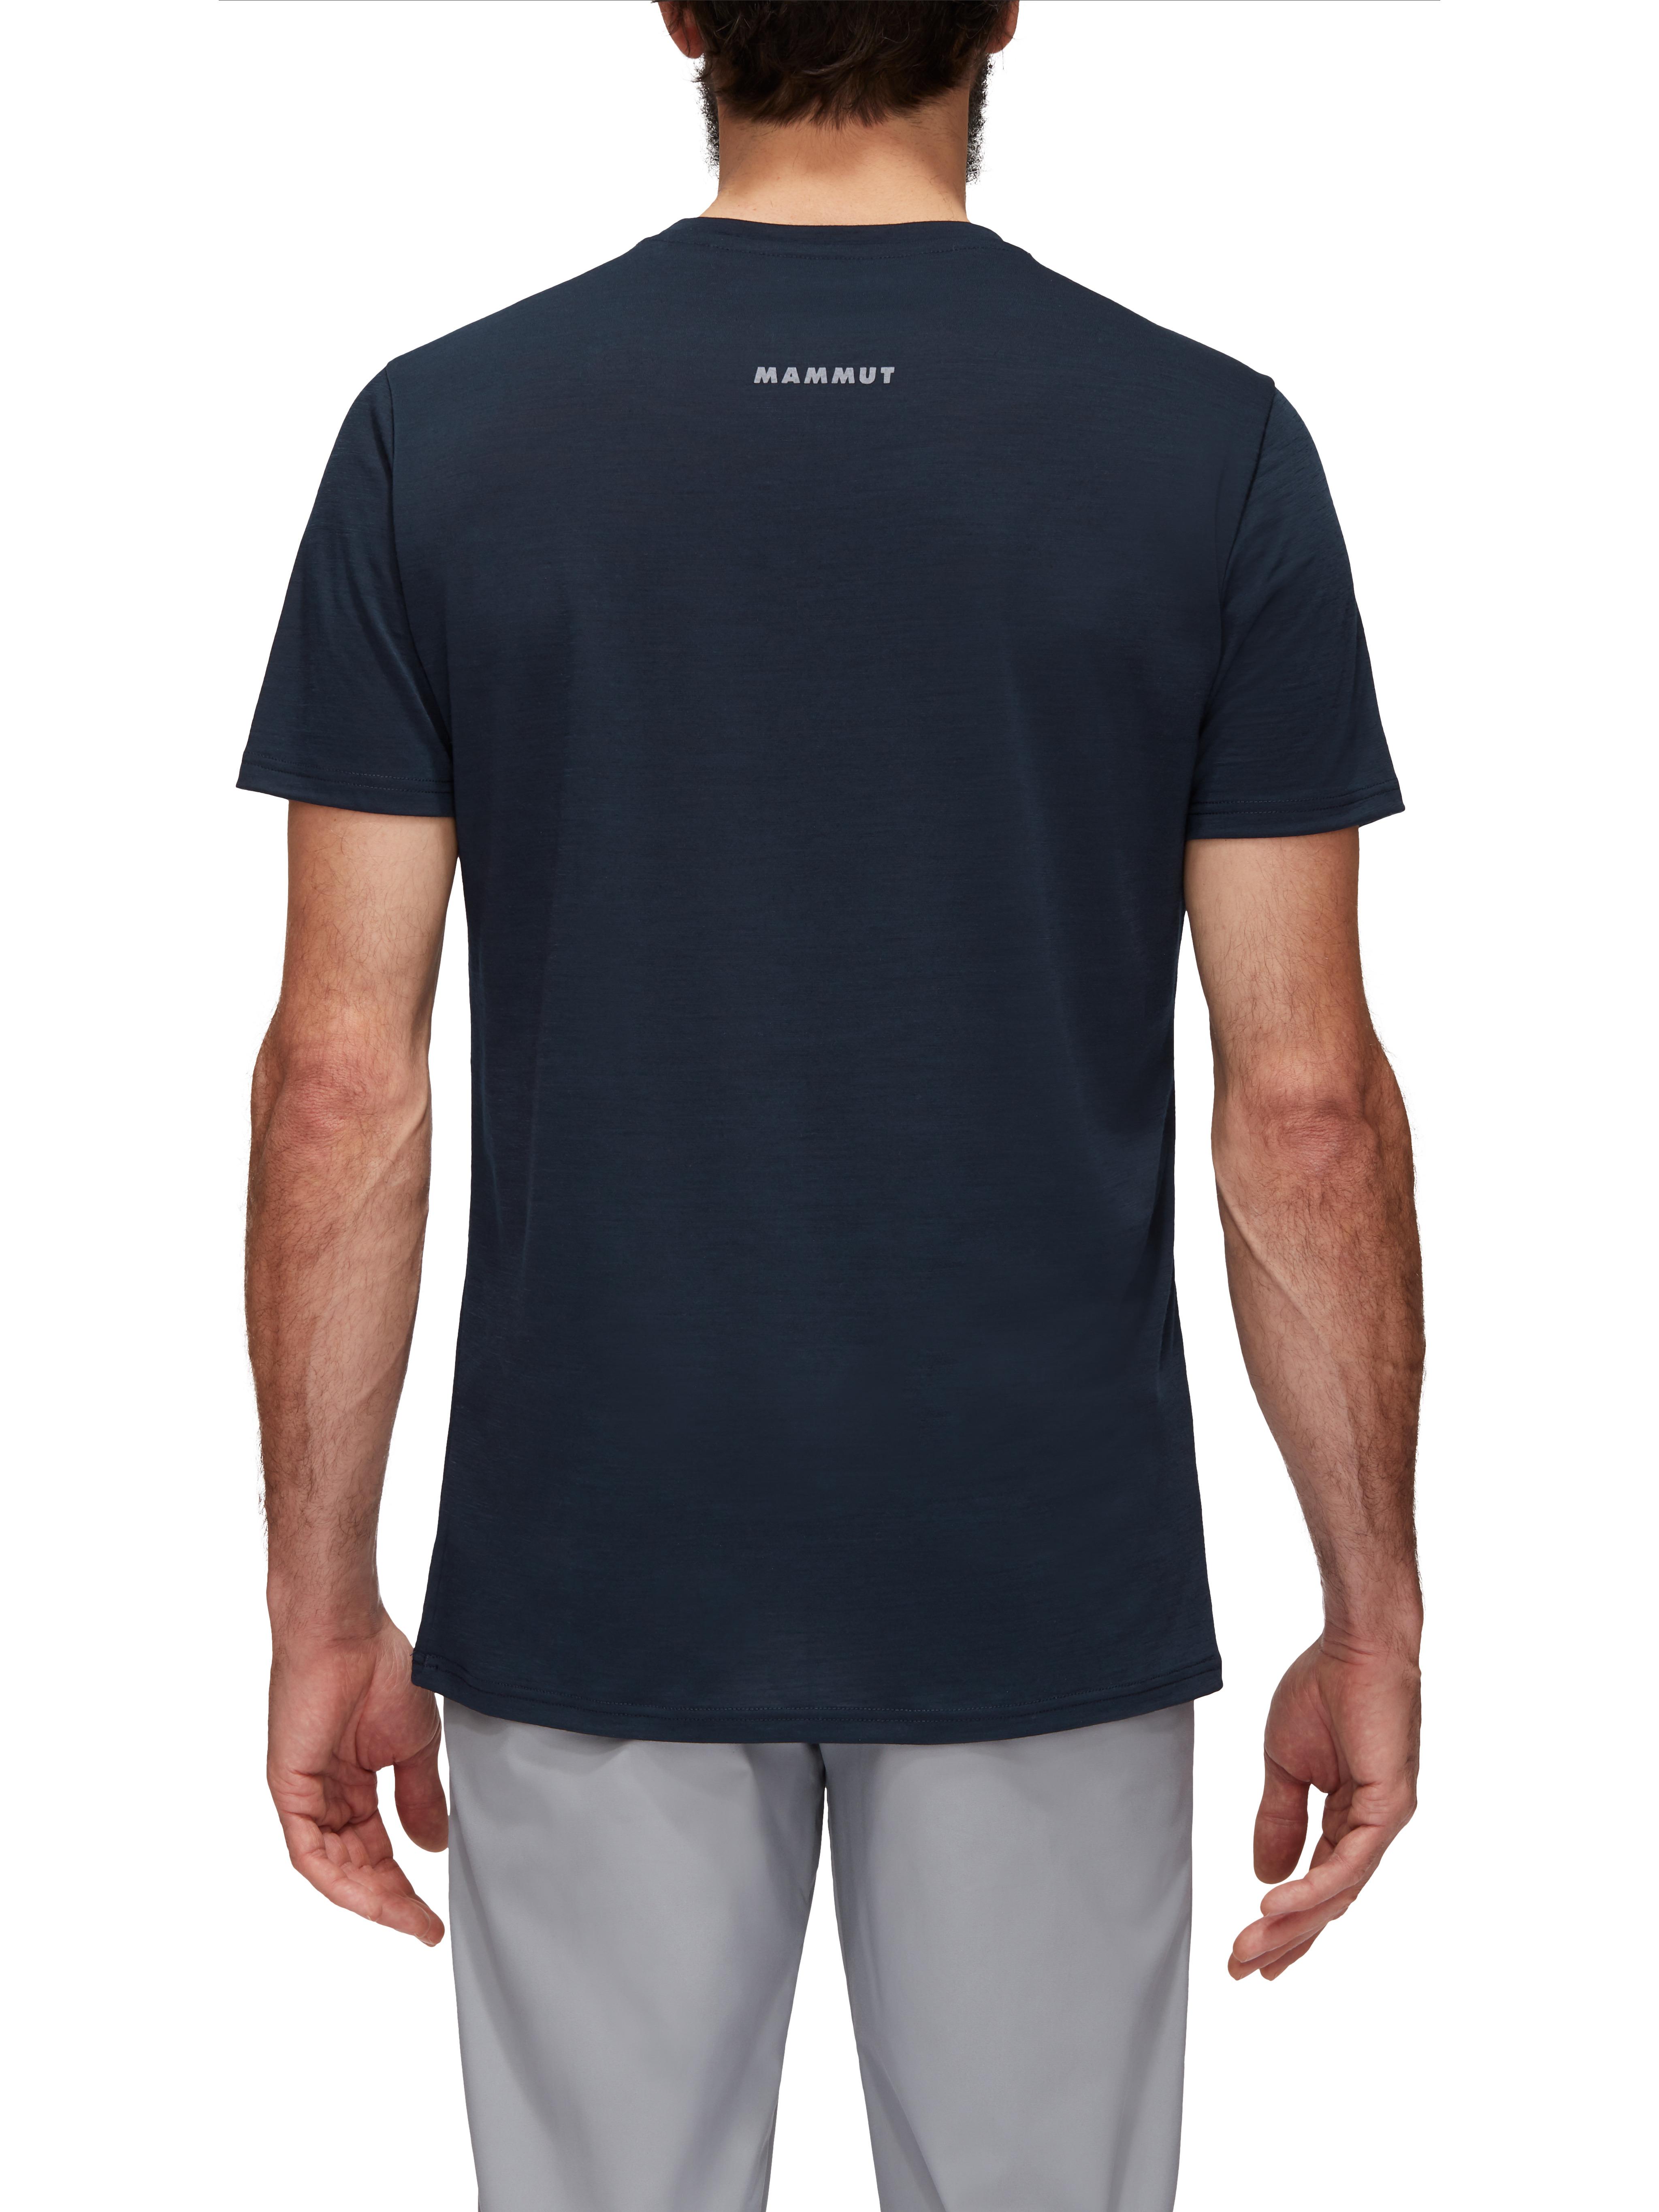 Alnasca T-Shirt Men thumbnail